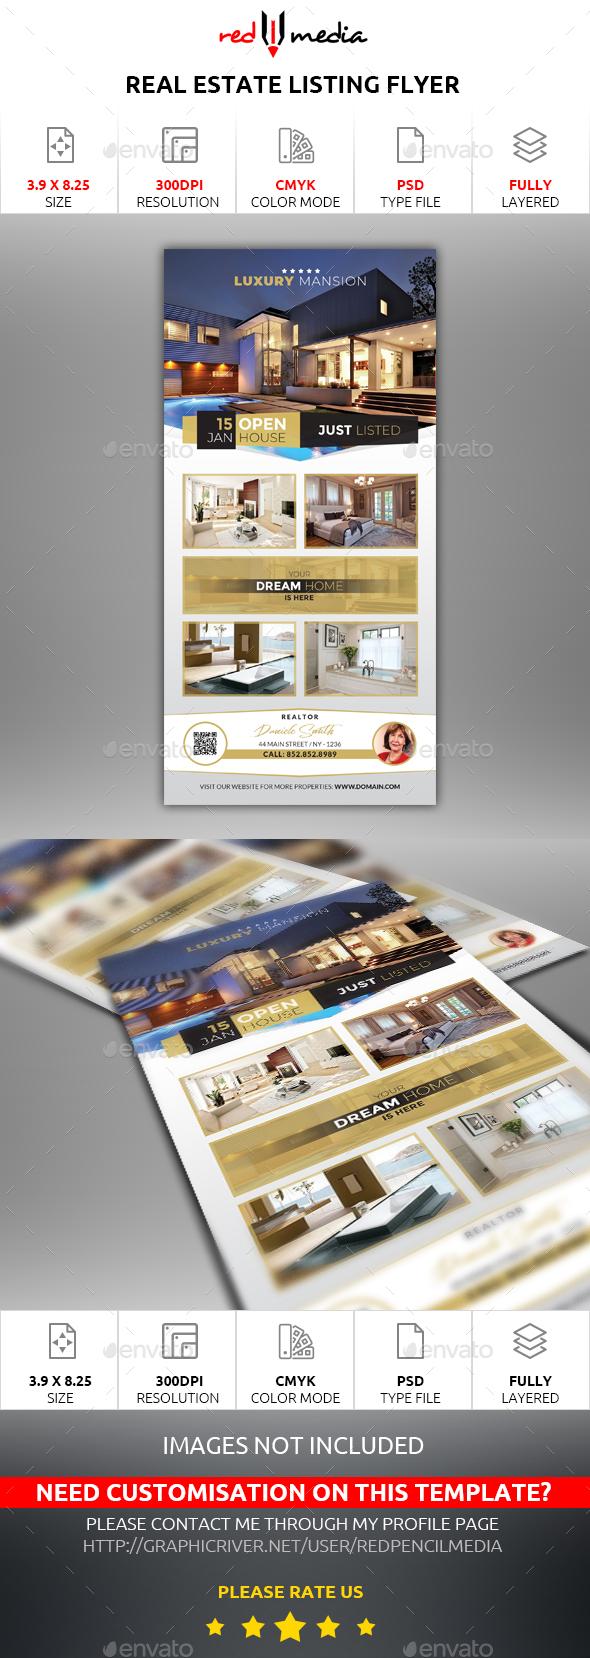 Real Estate Listing Flyer - Commerce Flyers